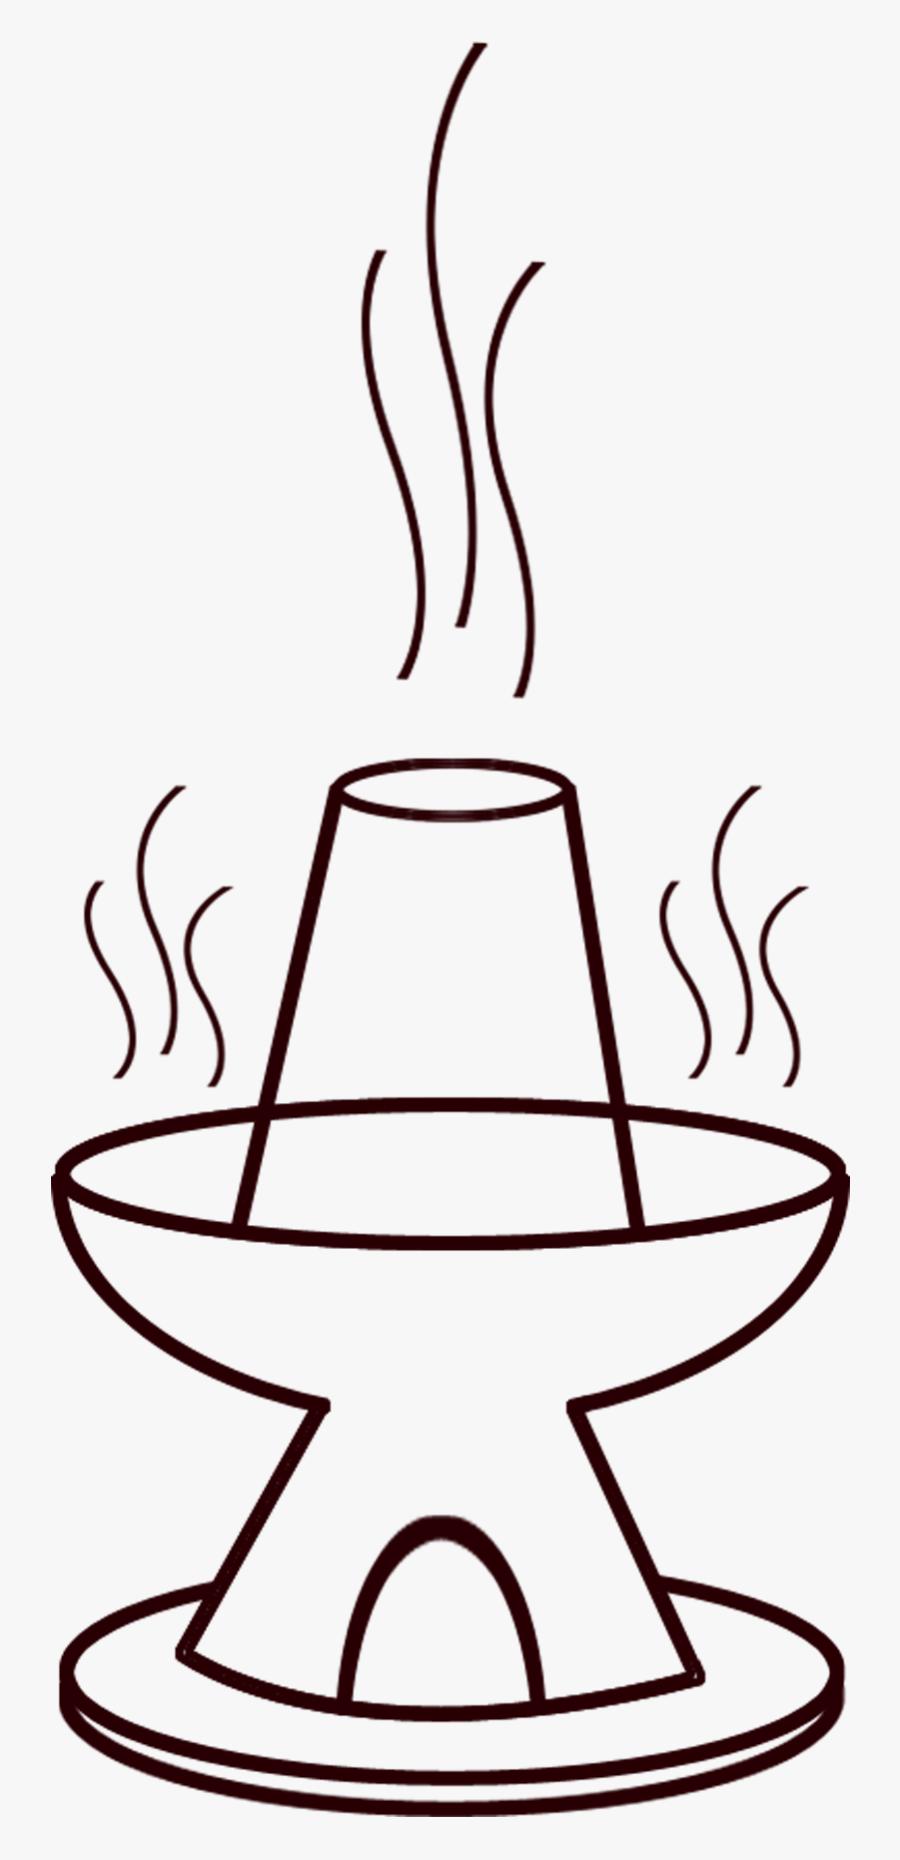 Hot Pot Fish Ball Black And White Meat - Hot Pot, Transparent Clipart